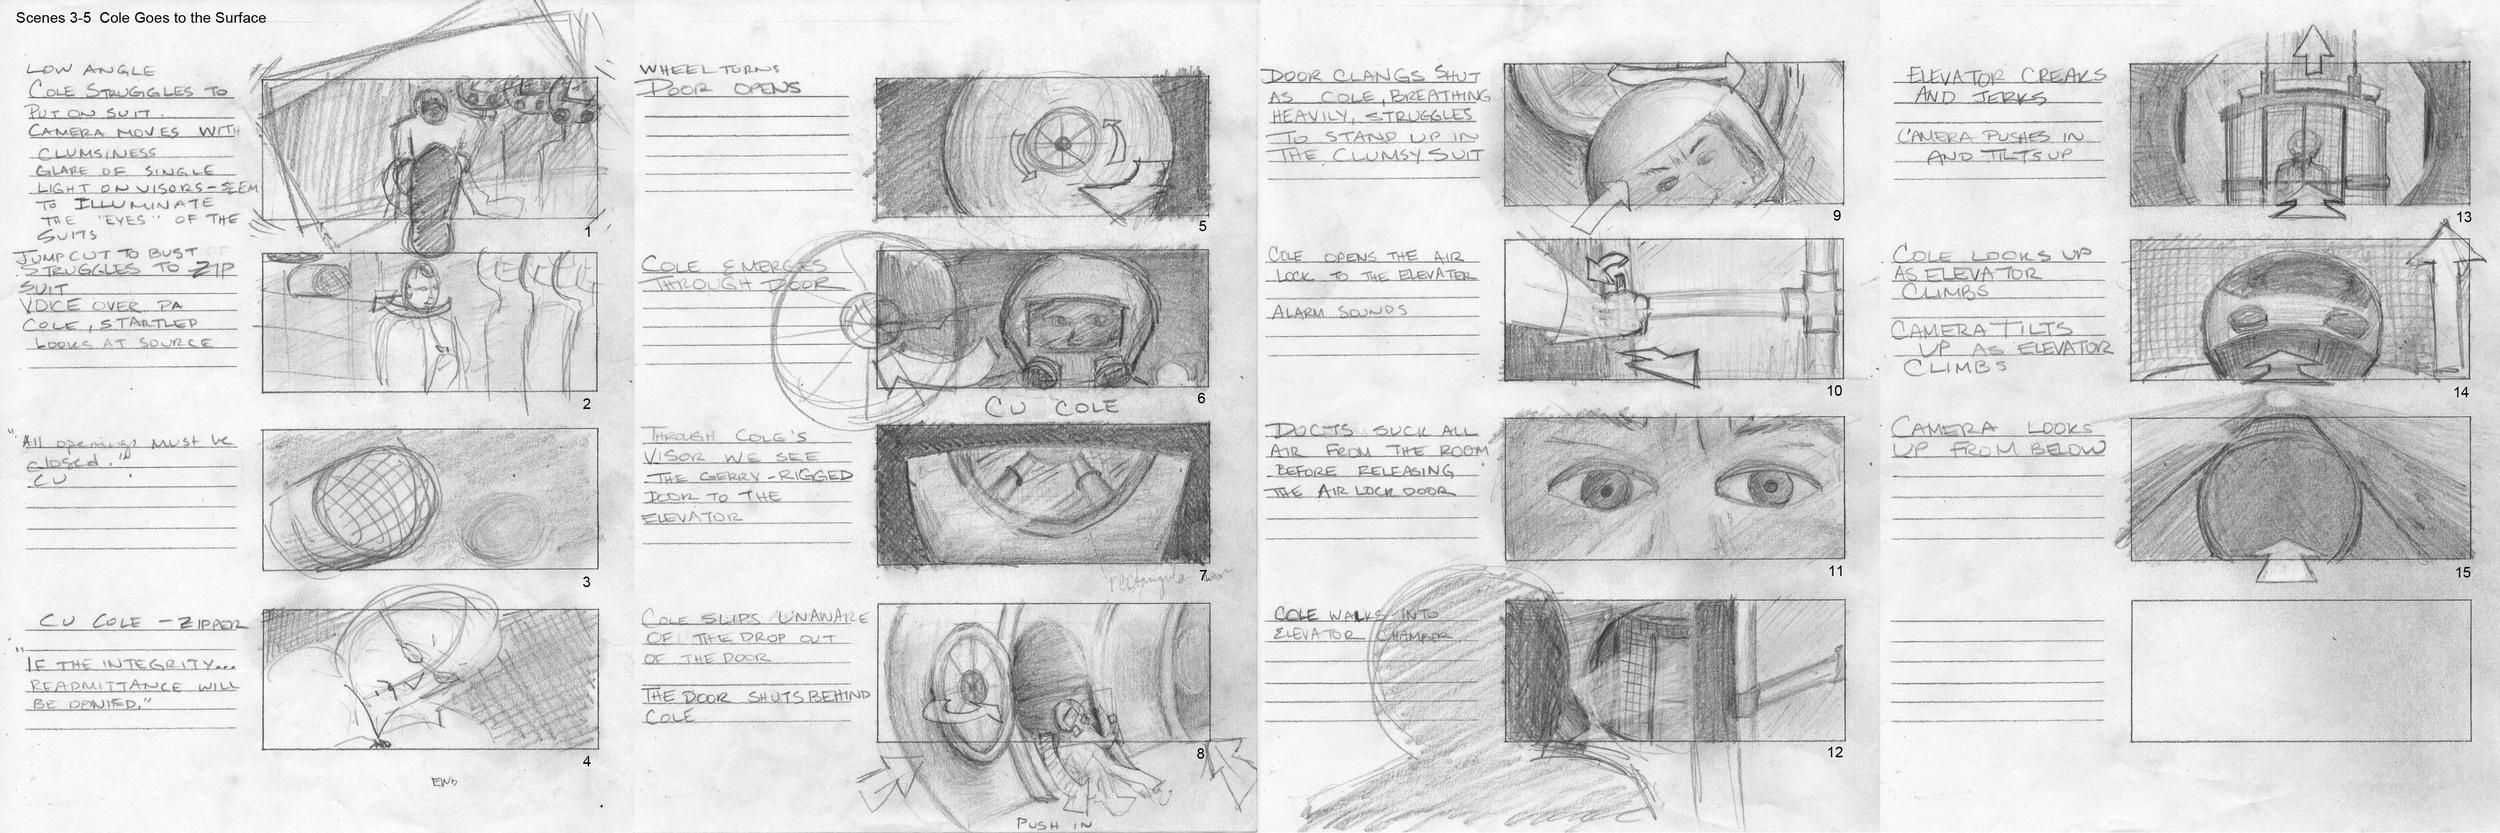 StoryboardSurface.jpg